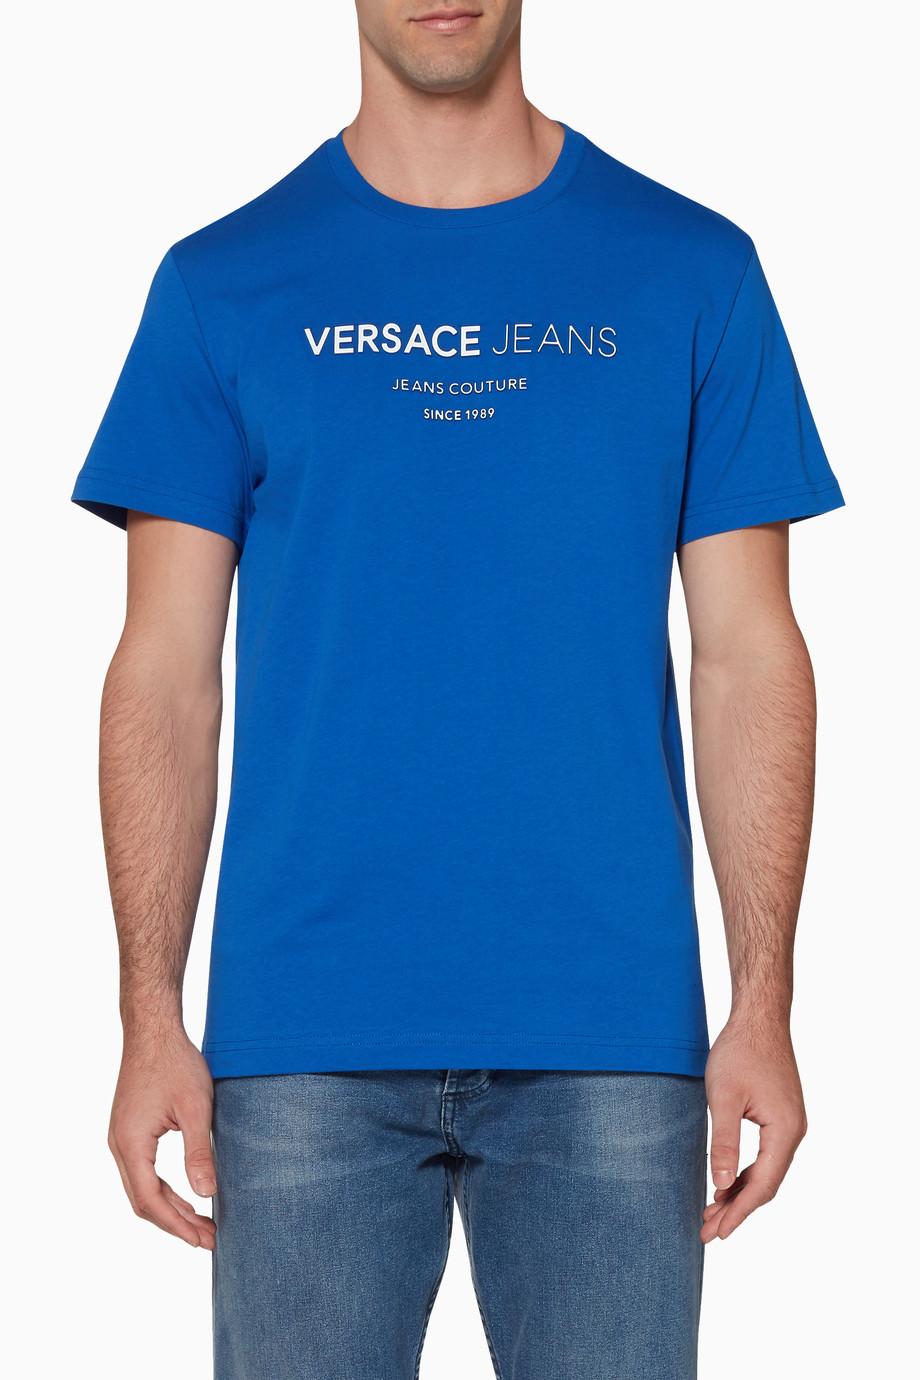 5e7fc90e3 Shop Versace Jeans Blue Blue & White Logo T-Shirt for Men | Ounass Saudi